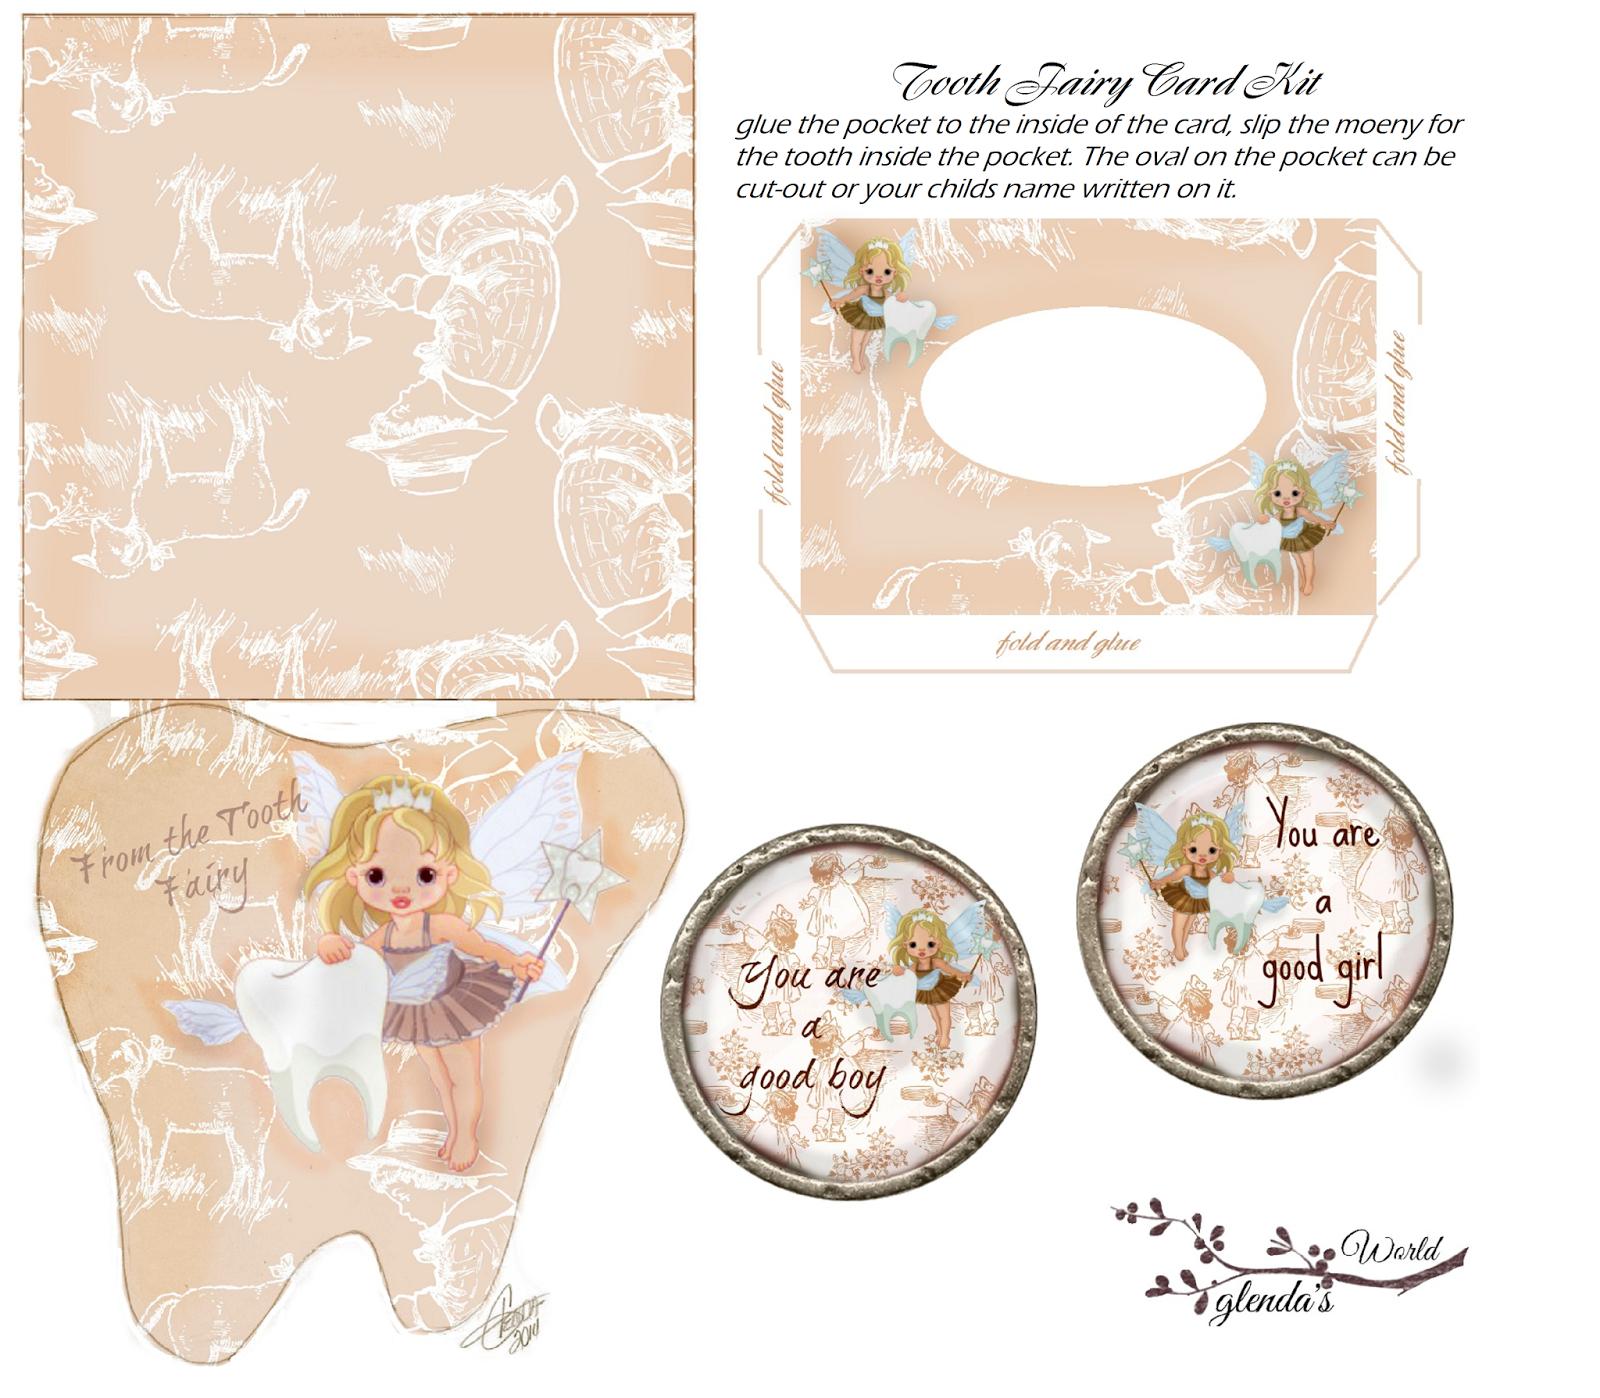 image regarding Tooth Fairy Card Printable named glendas Entire world : Enamel Fairy Card Package